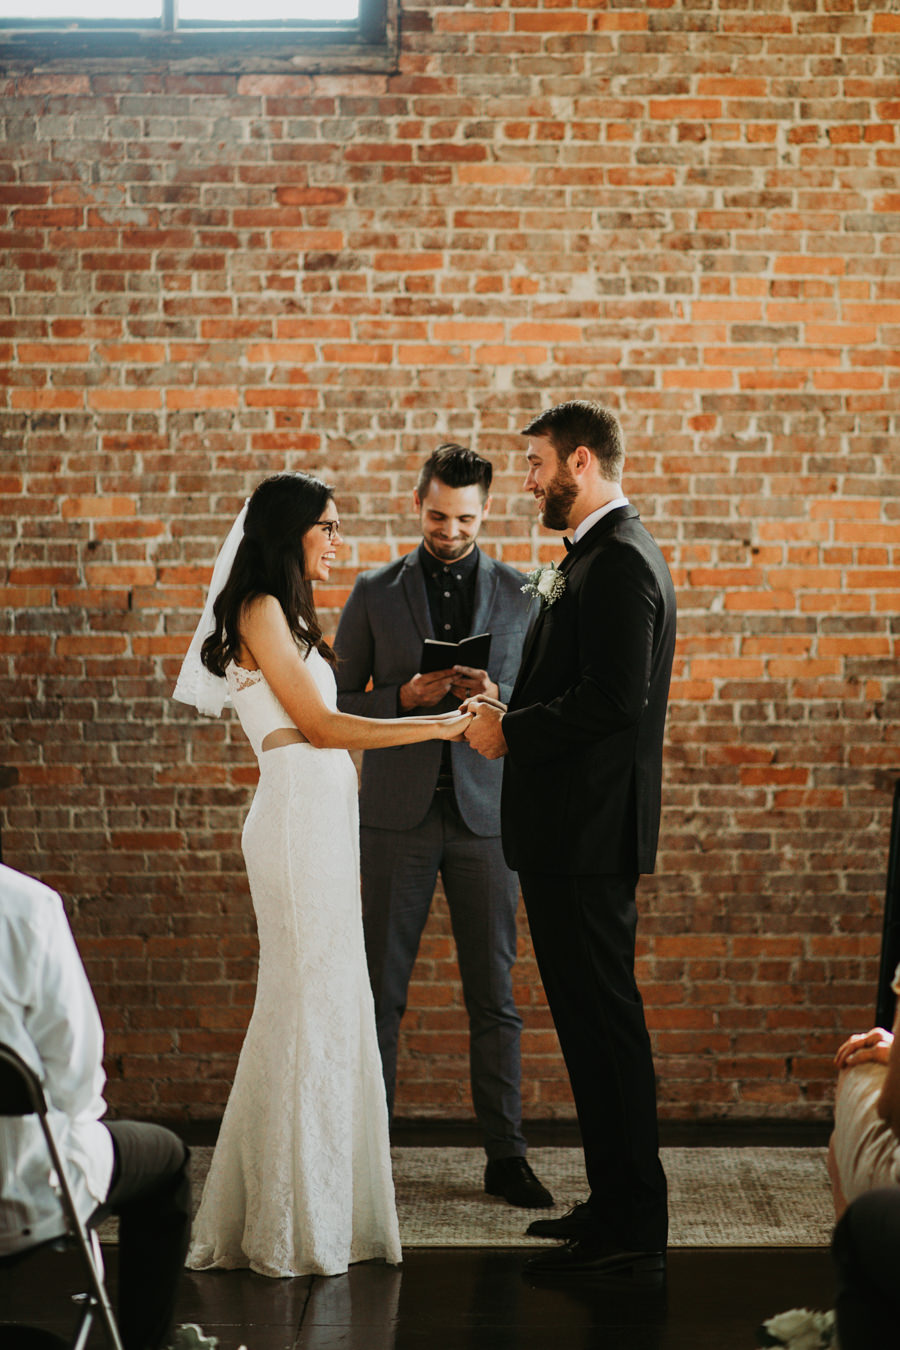 Tampa Heights Industrial Wedding at Cavu Emmy RJ-73.jpg